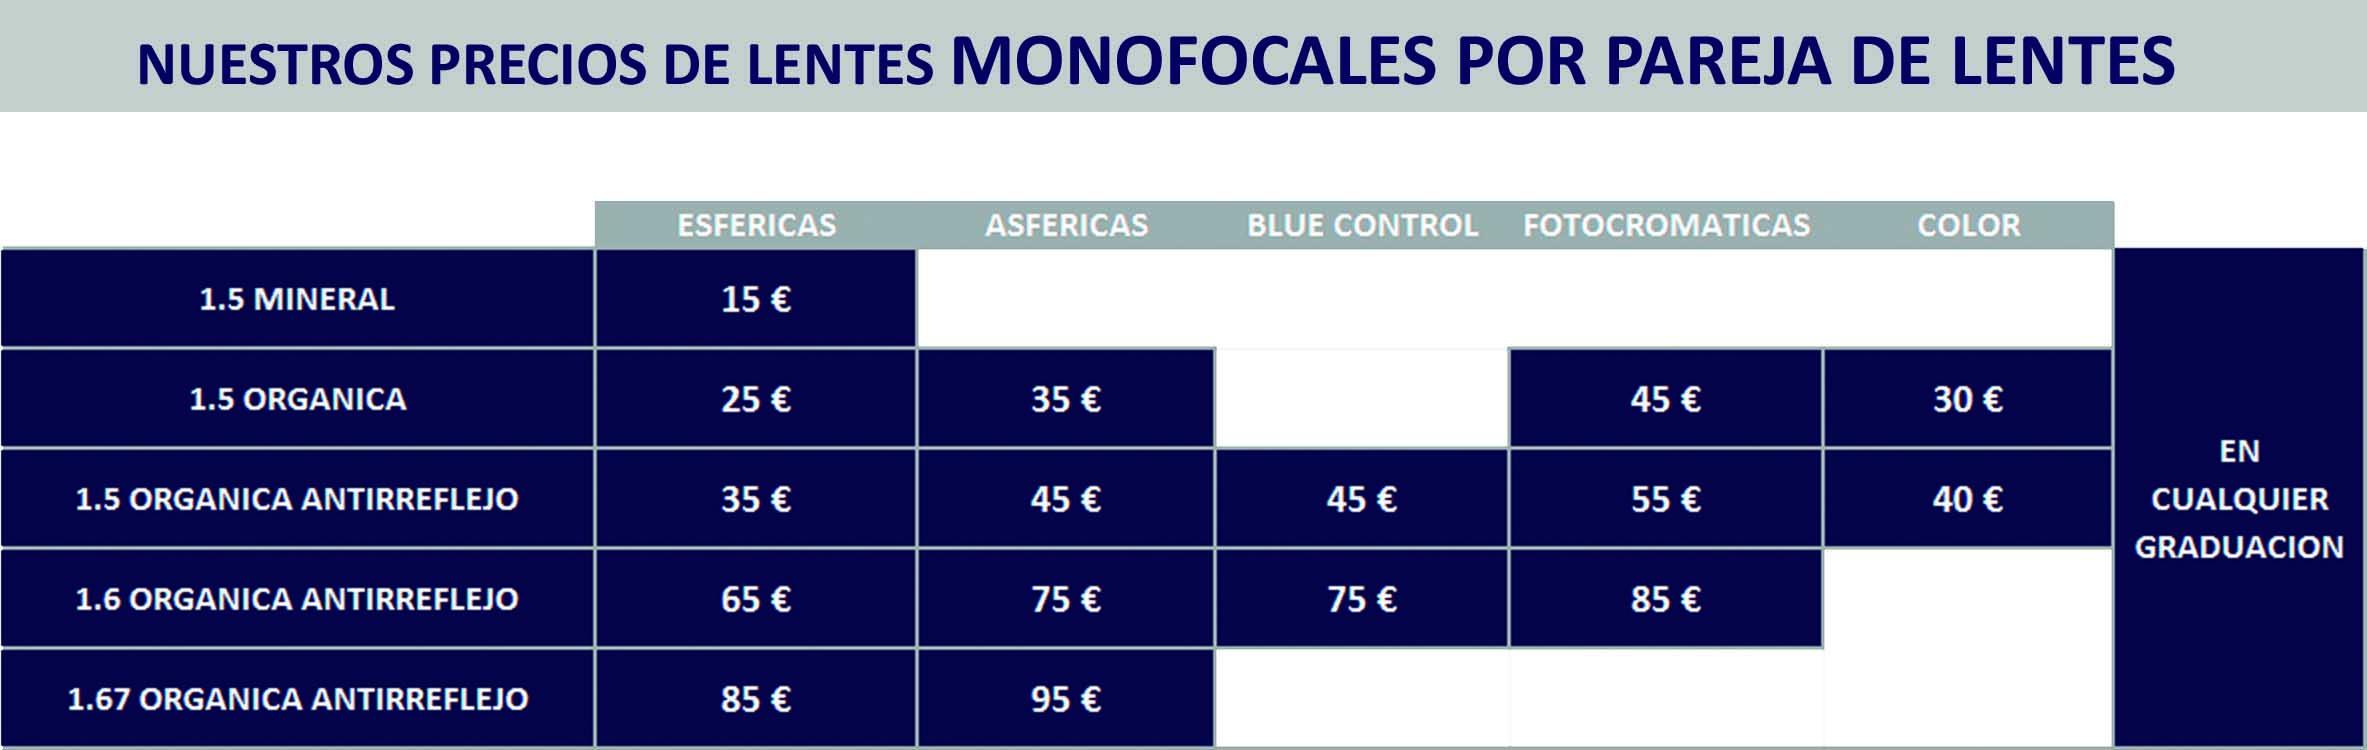 1ed2292e52 Lentes Monofocales | NavOptica